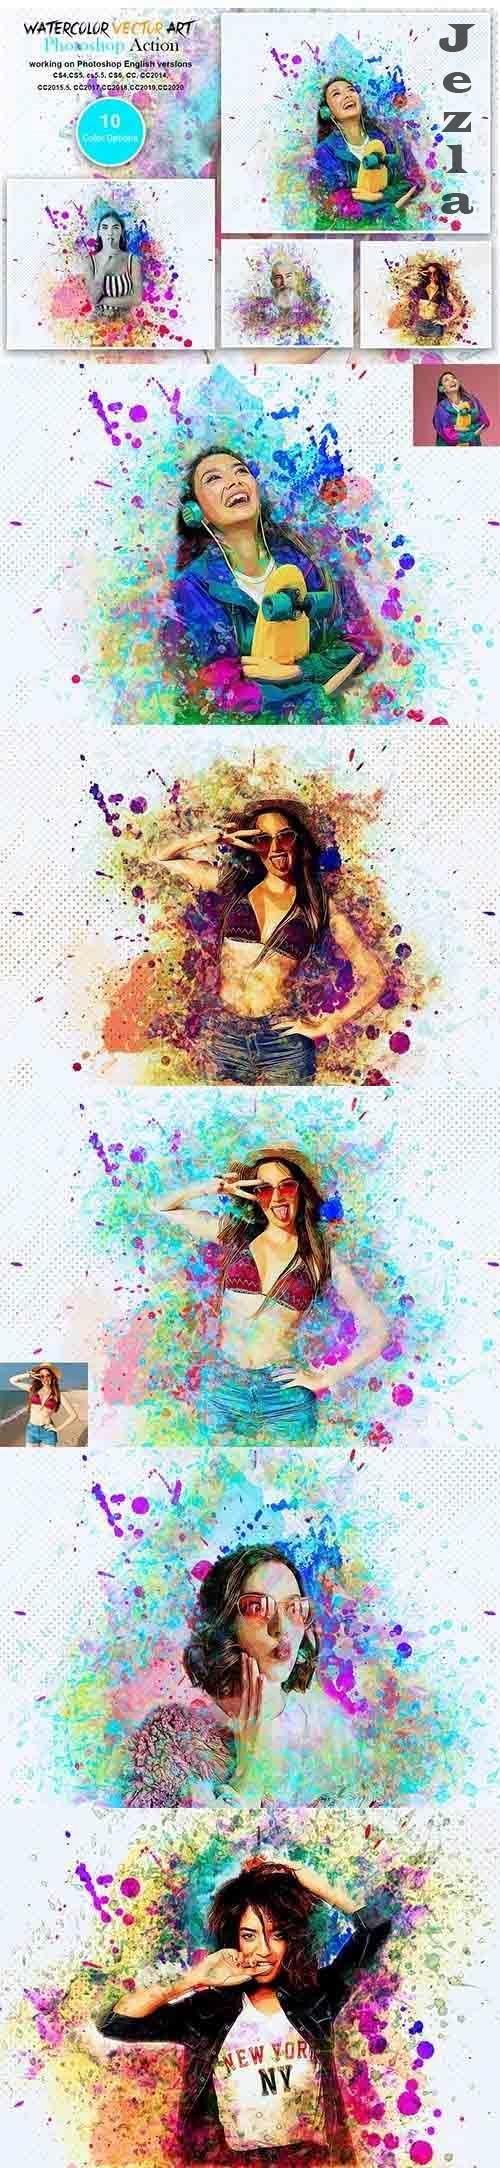 CreativeMarket - Watercolor Vector Art PS Action 5566054